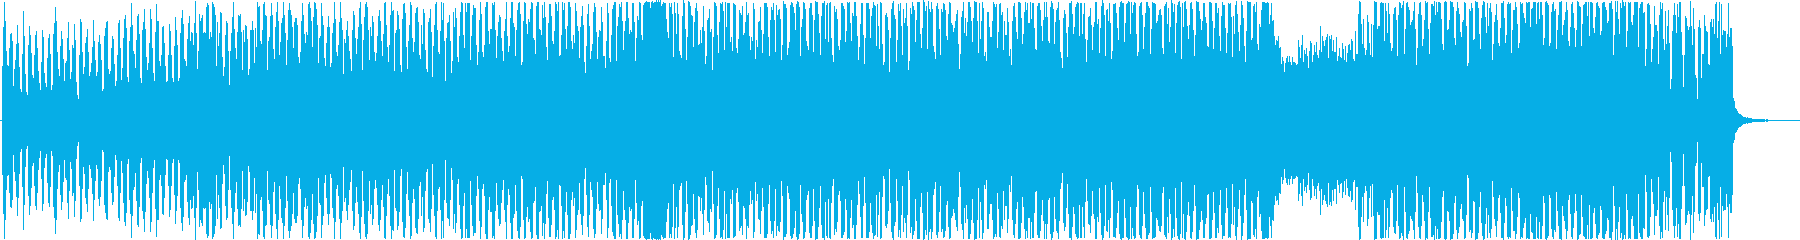 g線上のアリアのエレクトロアレンジです。の再生済みの波形